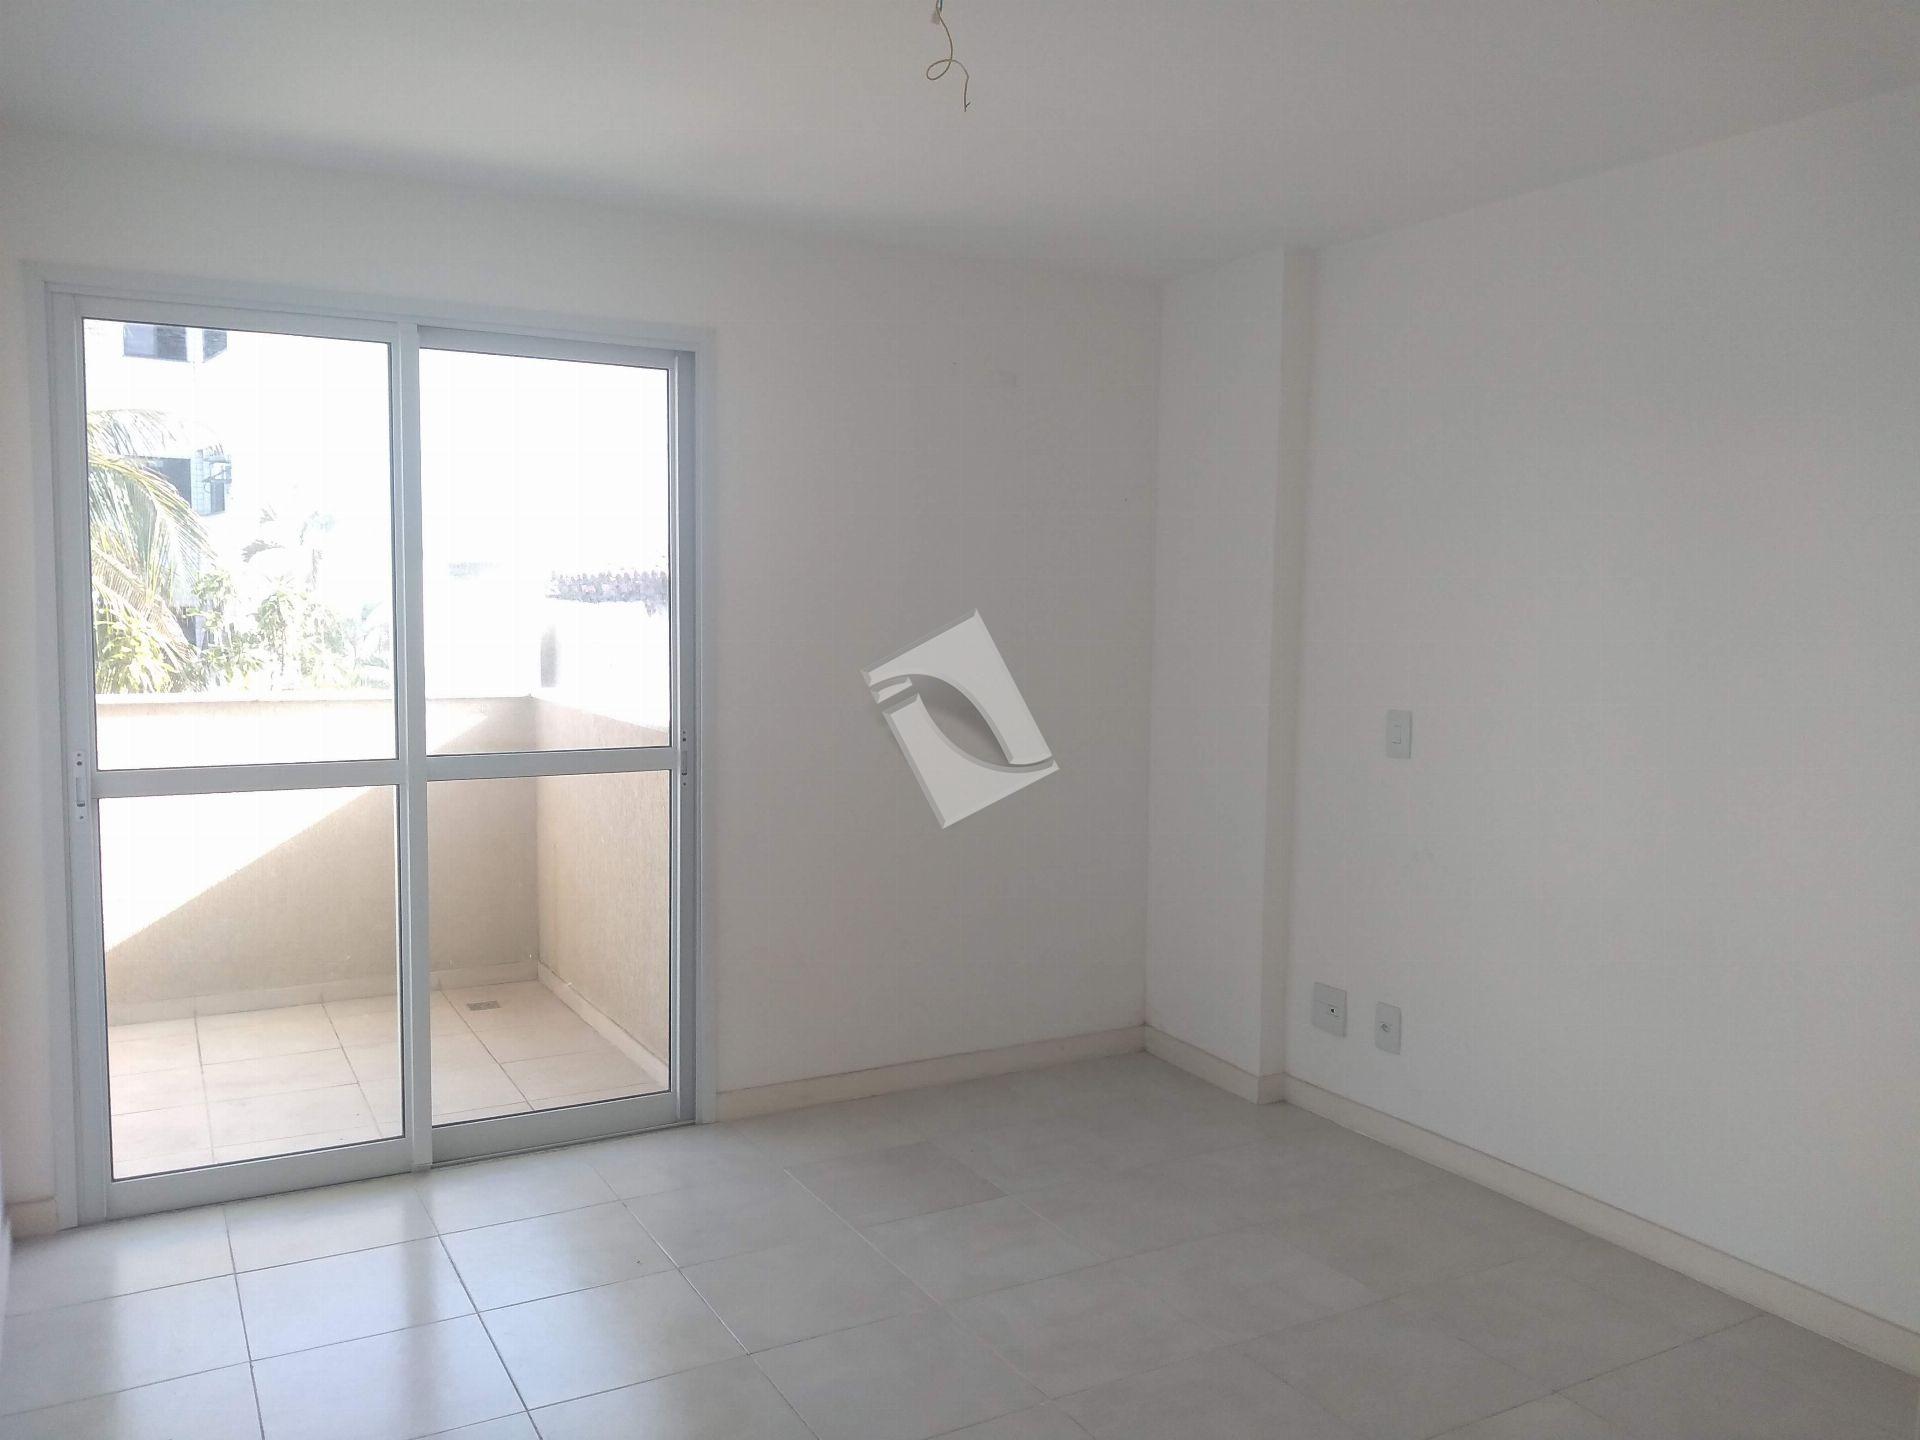 Apartamento Para Alugar - Recreio dos Bandeirantes - Rio de Janeiro - RJ - 042B - 5